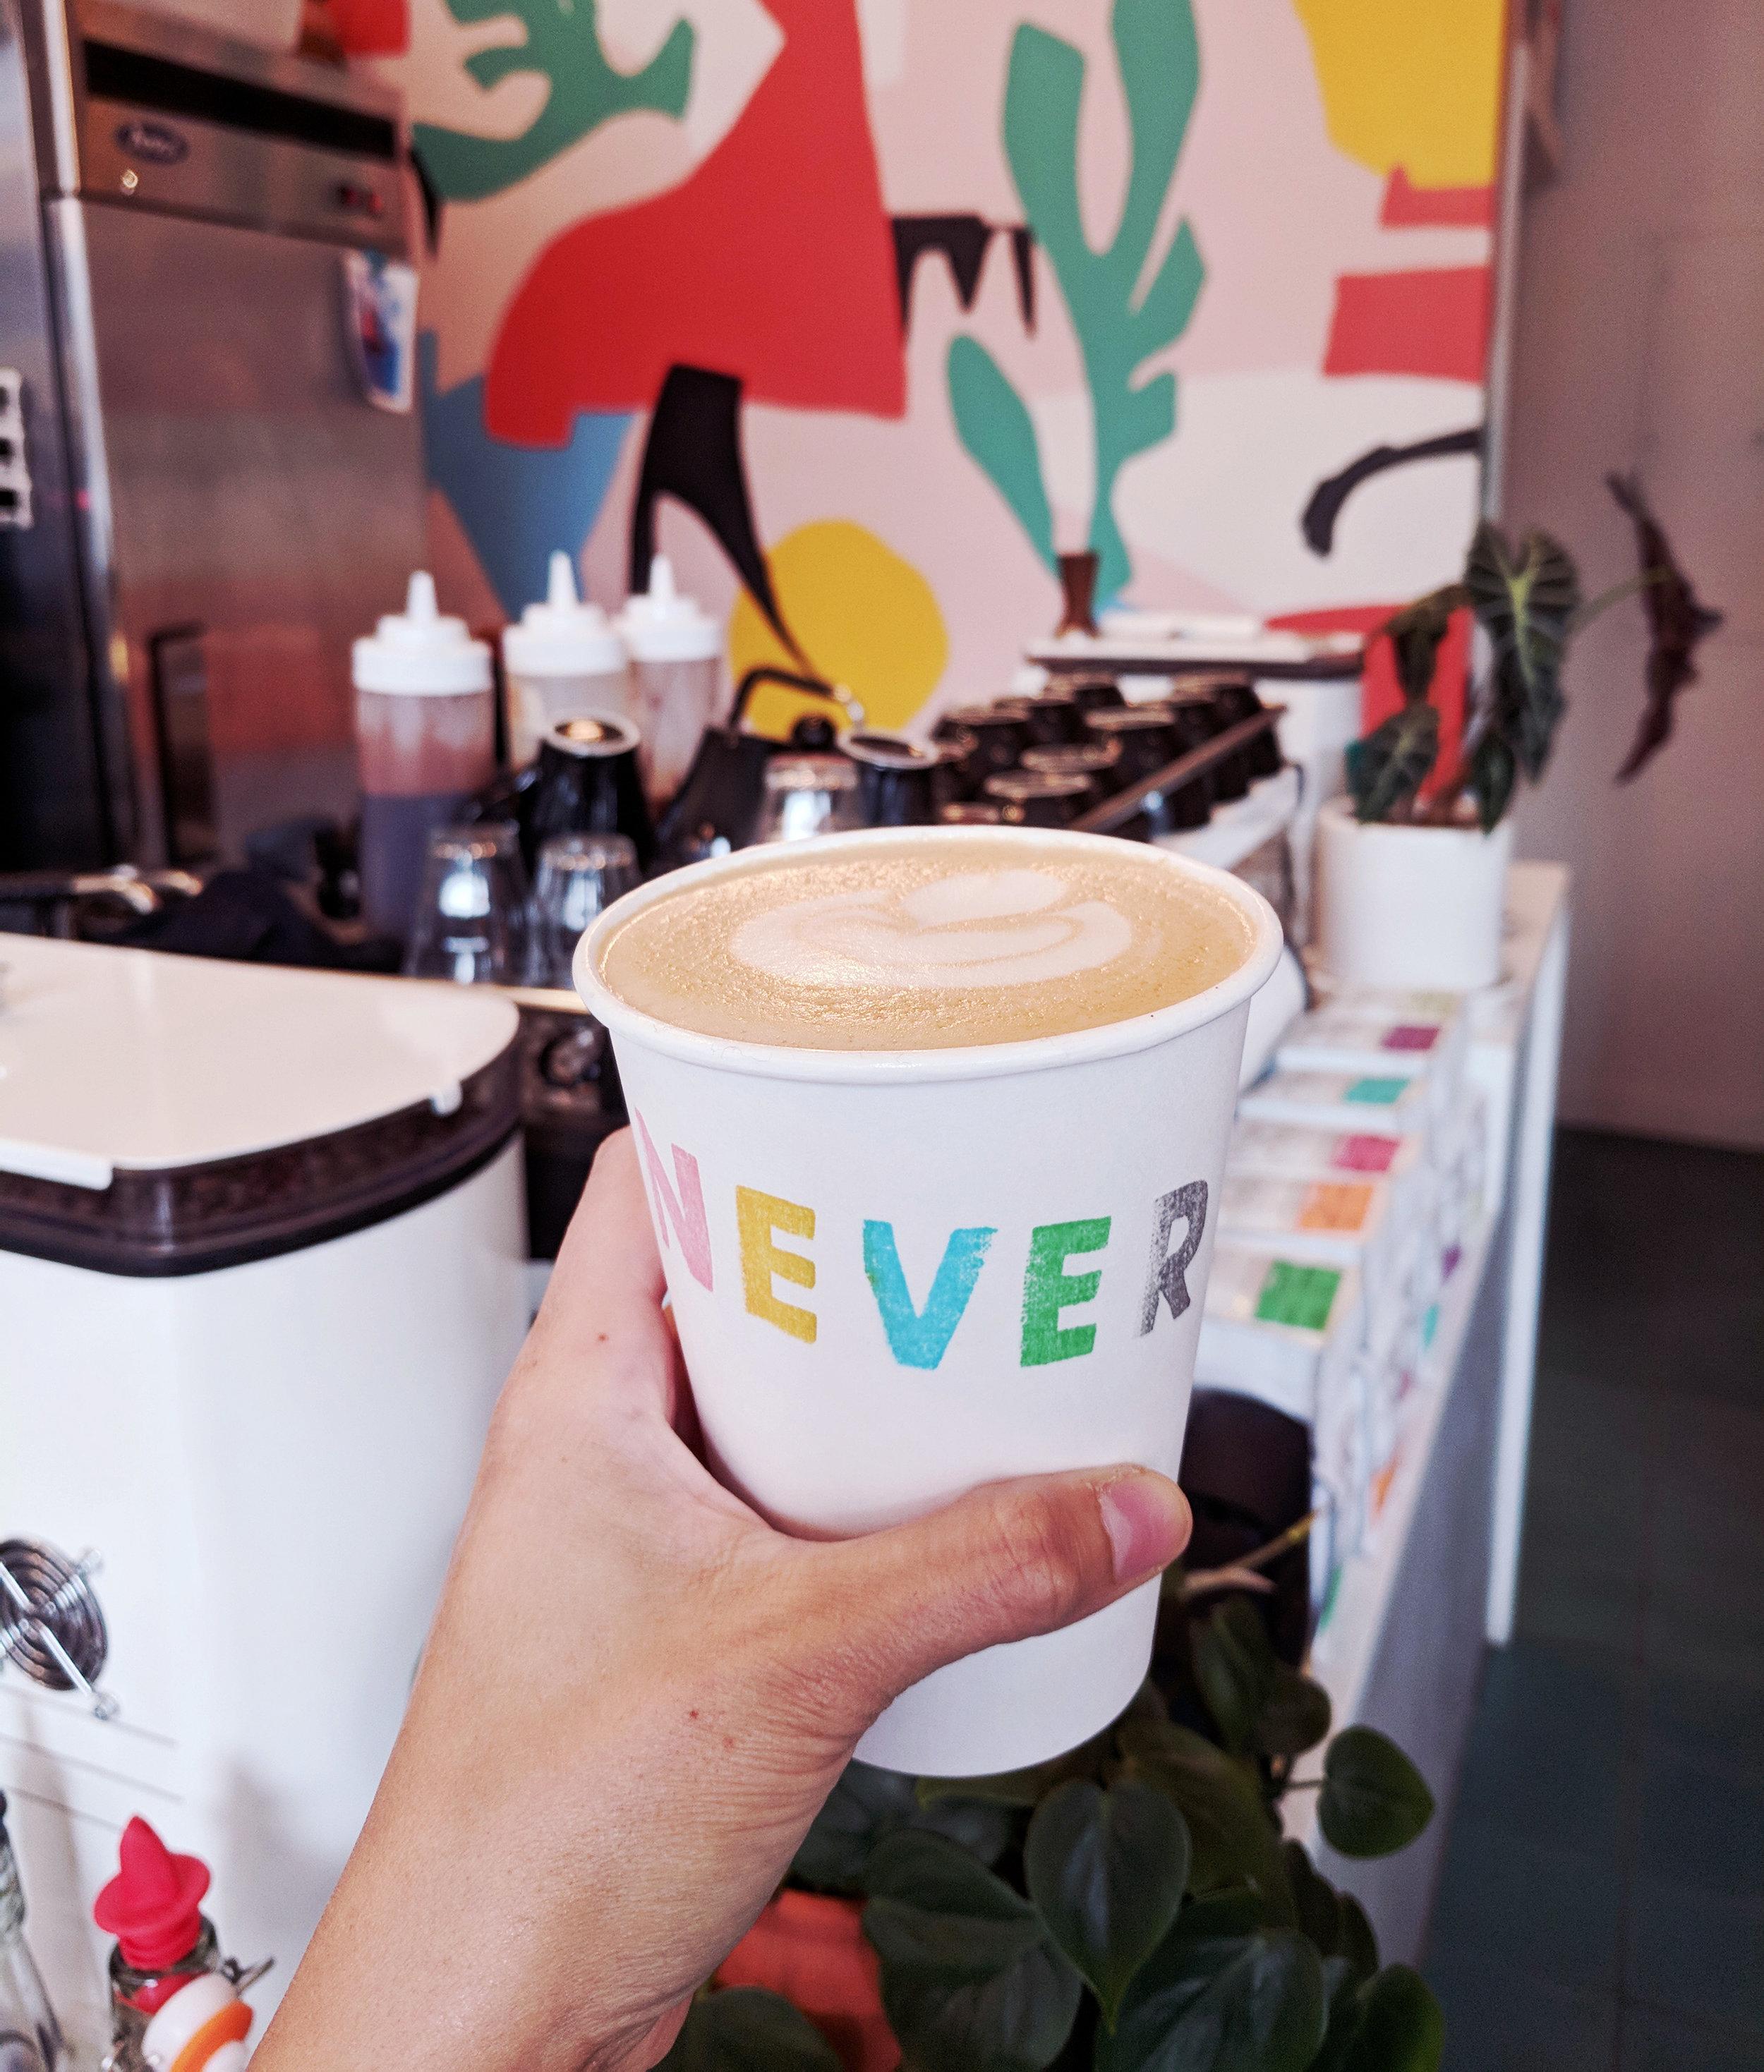 never-coffee-rich-kid-latte.jpg